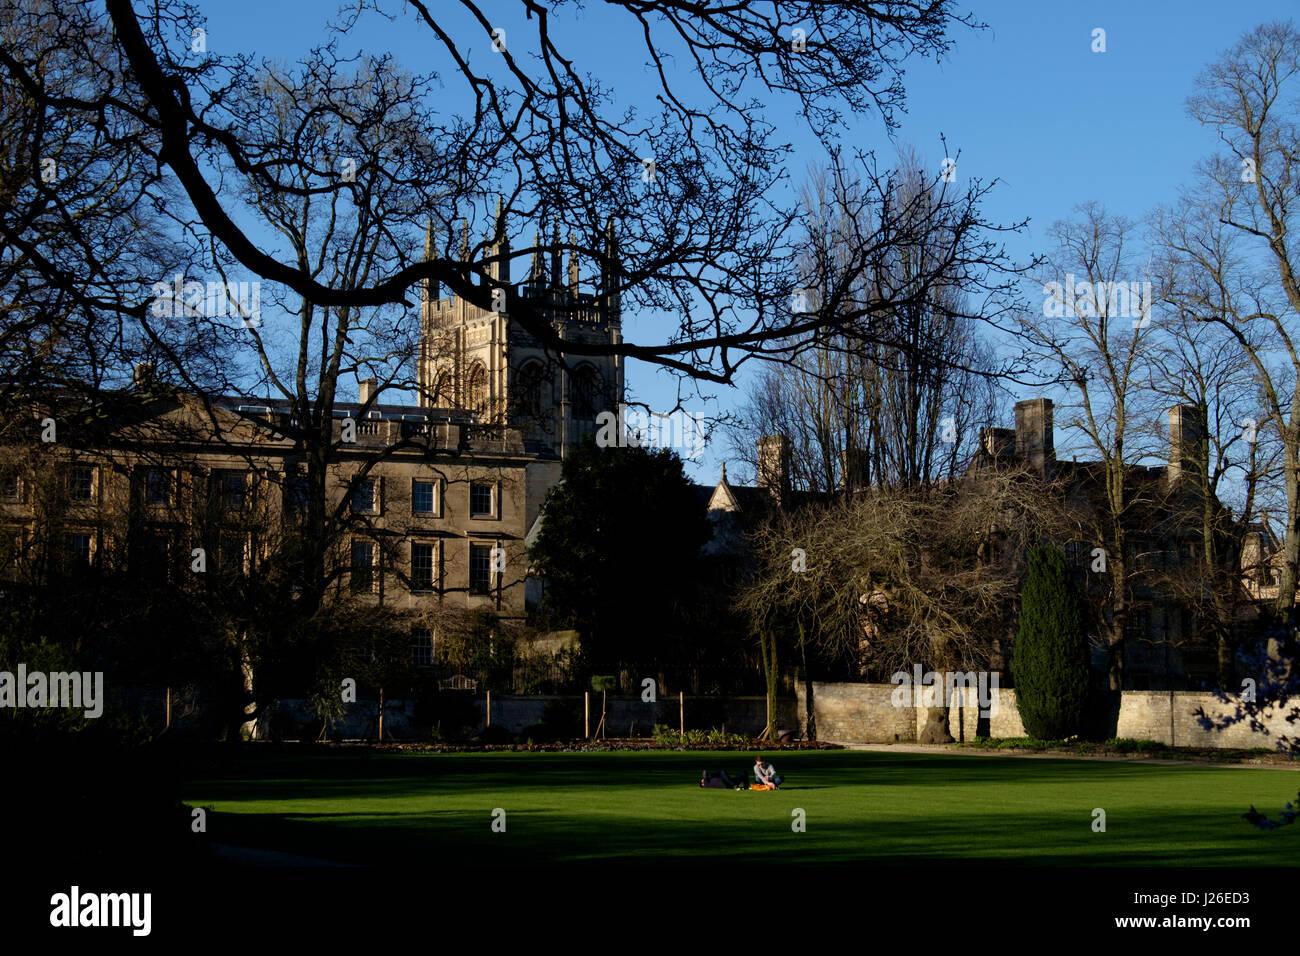 Corpus Christi College in Oxford, Oxfordshire, England, United Kingdom - Stock Image